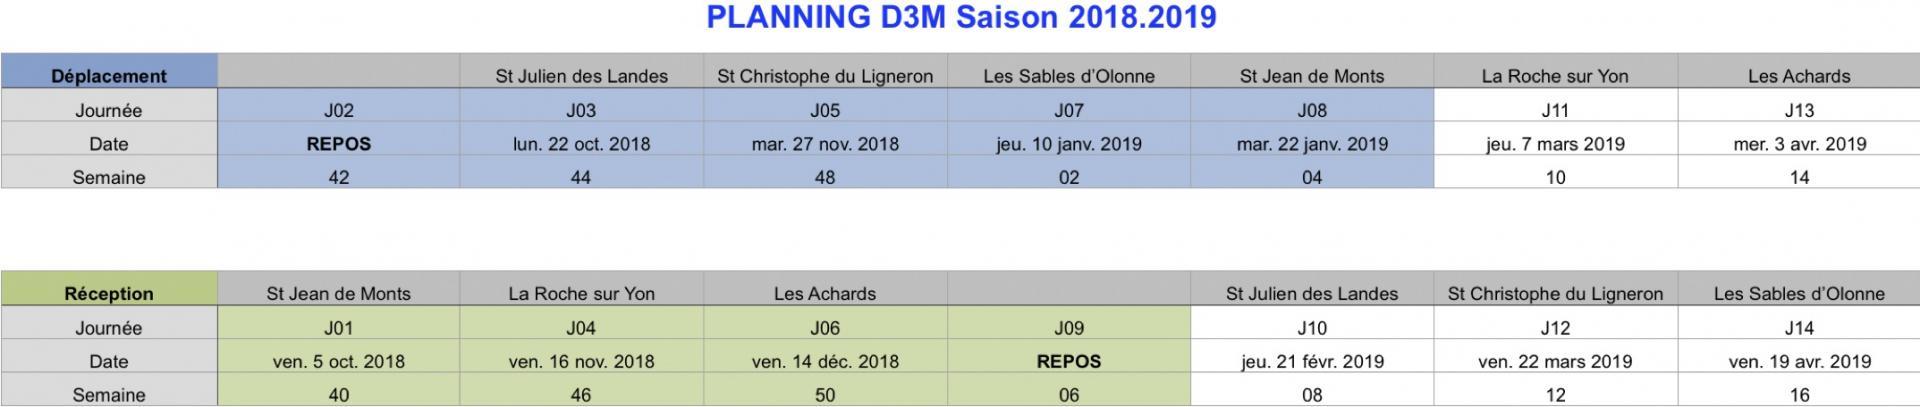 D3m 2018 19 s2 planning 8